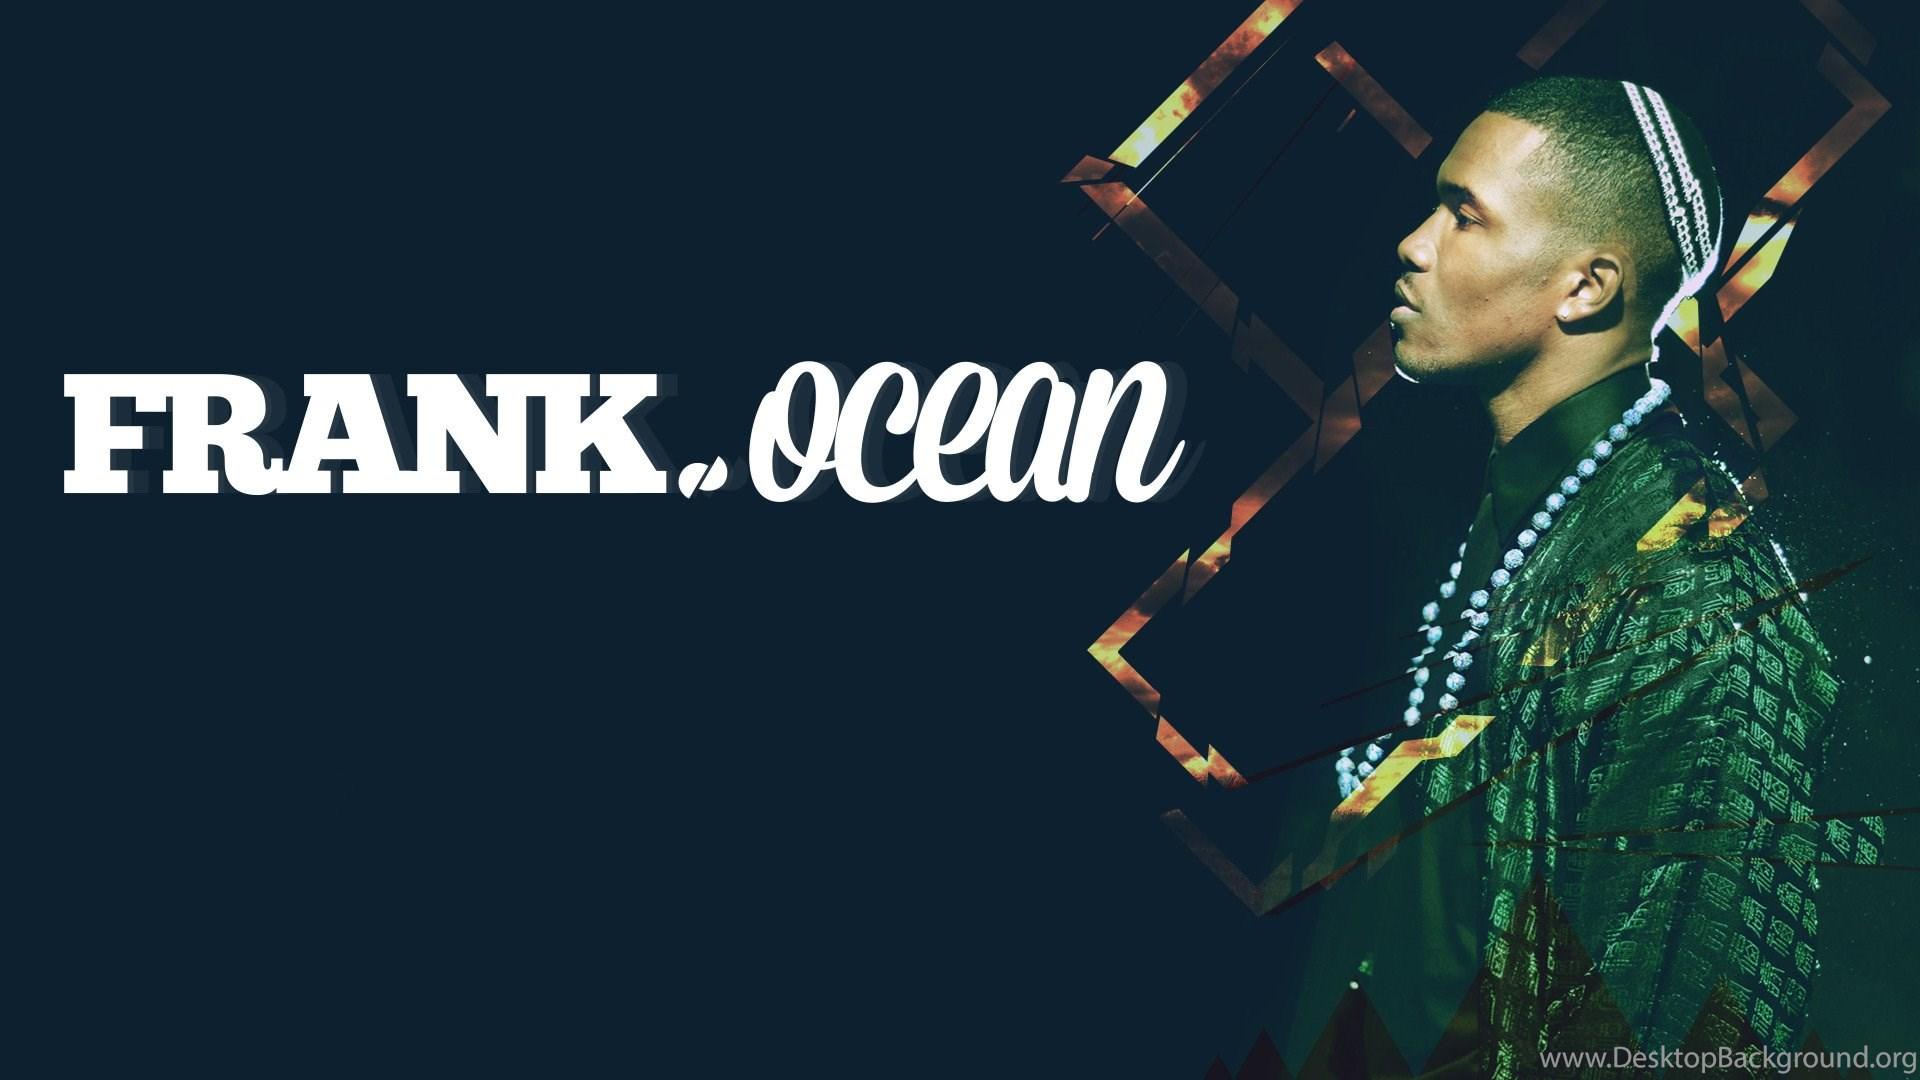 Since I M A Frank Ocean Fan I Had To Do Something For My Desktop Desktop Background